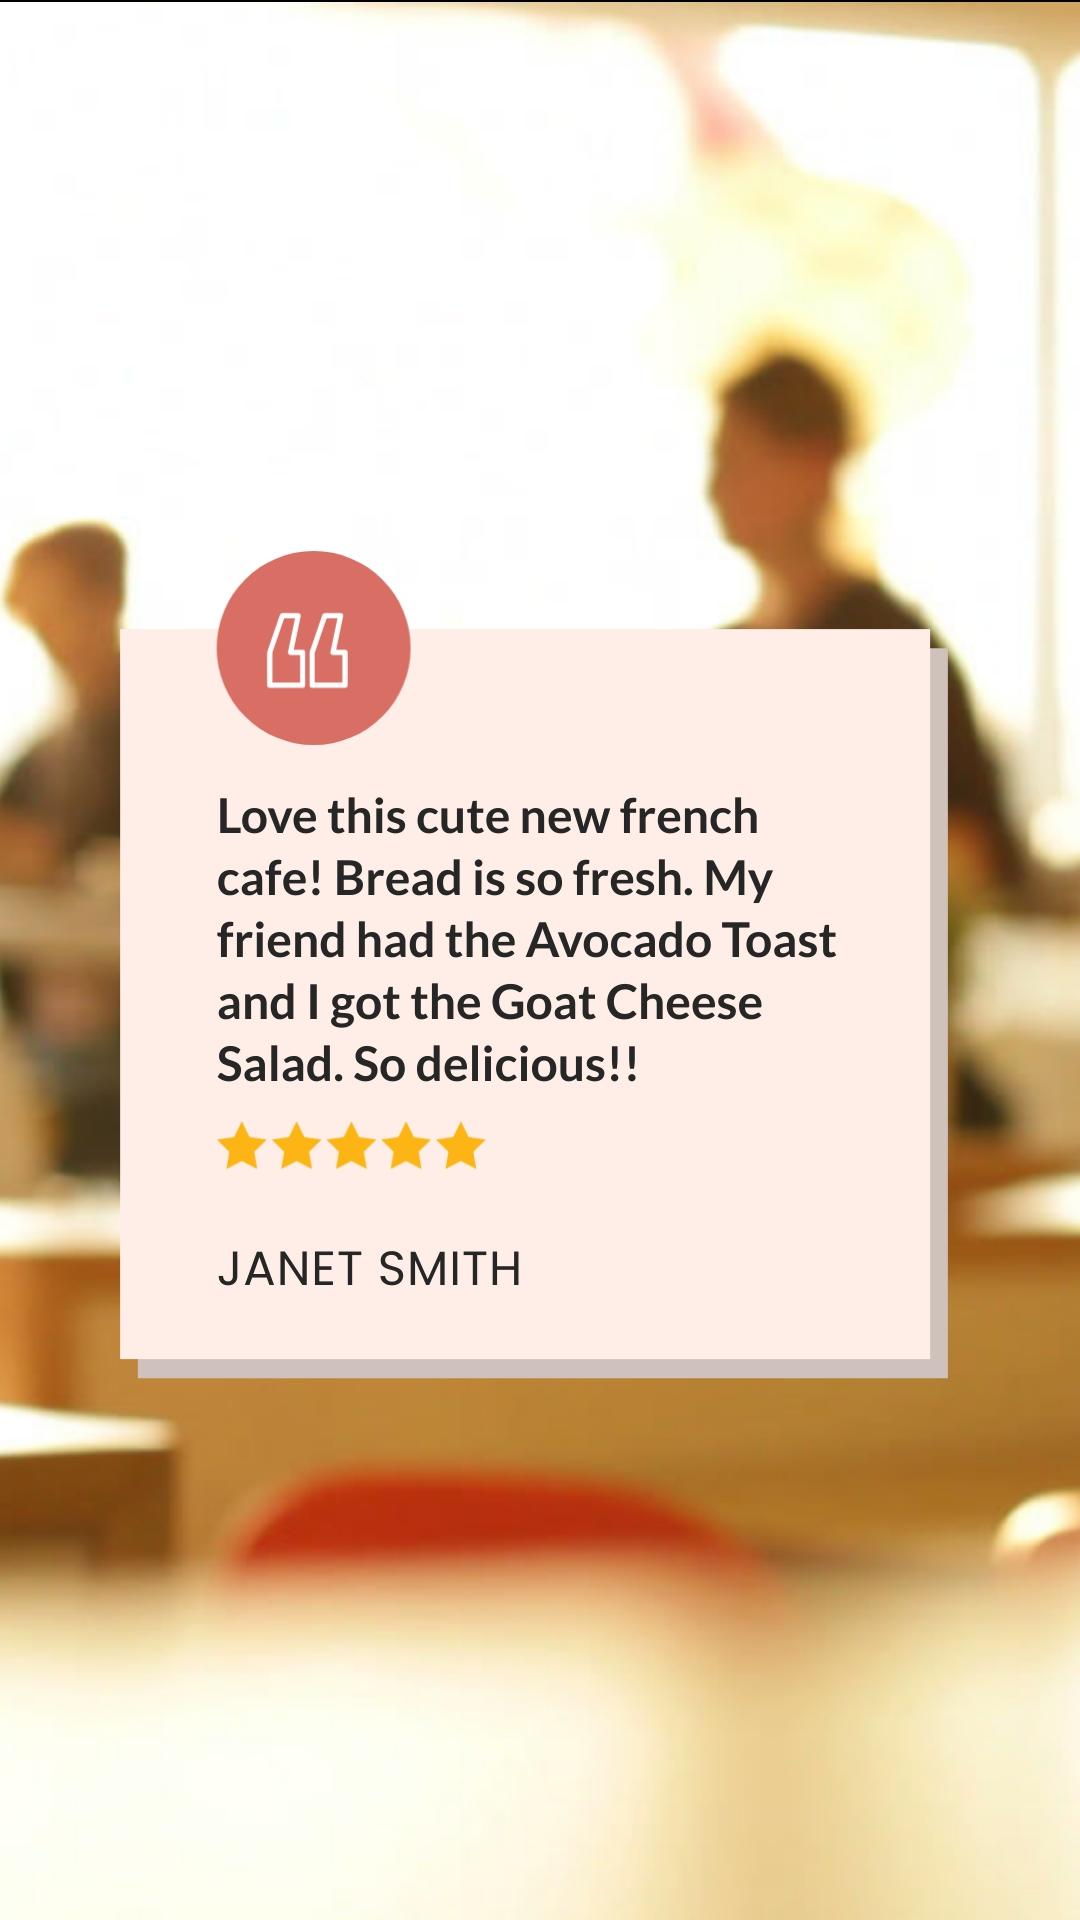 Cafe Reviews - Video Testimonial Vertical Template